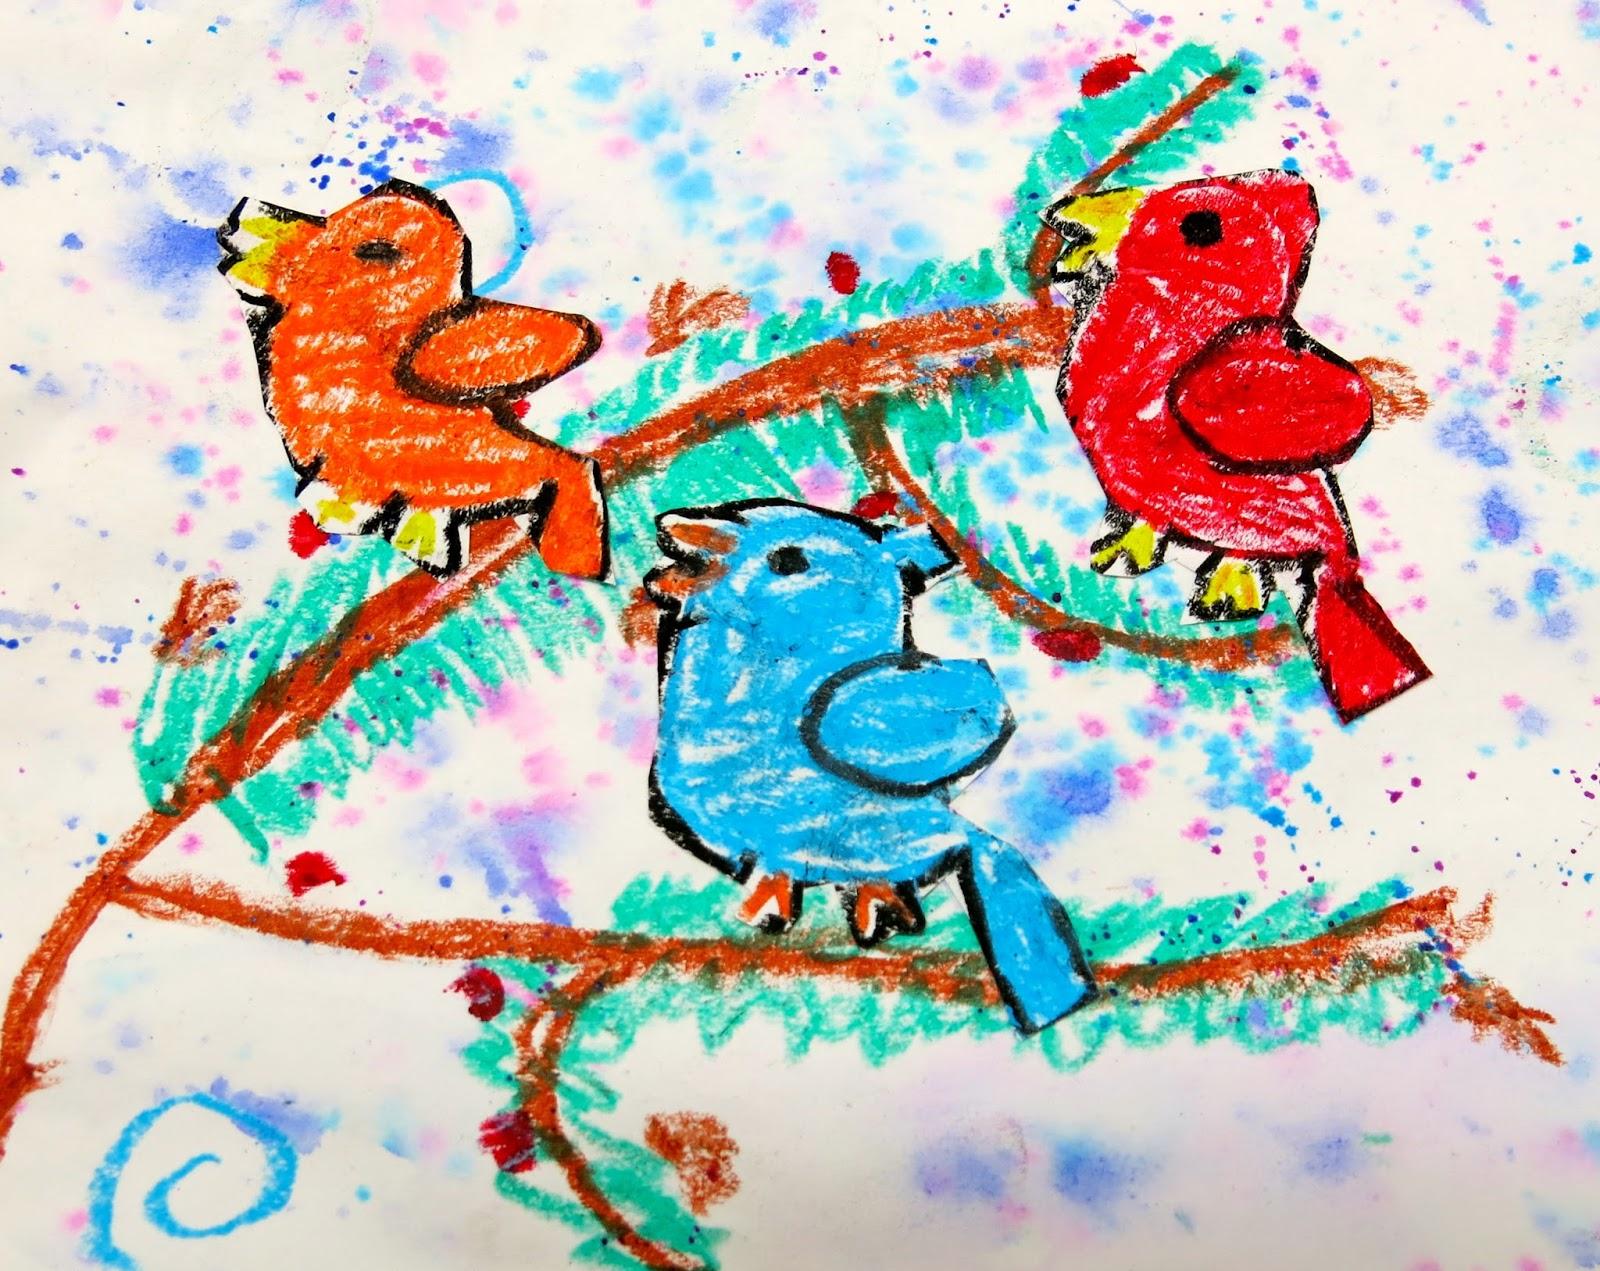 Art Study in the Elementary Years - Happy Homeschool Nest